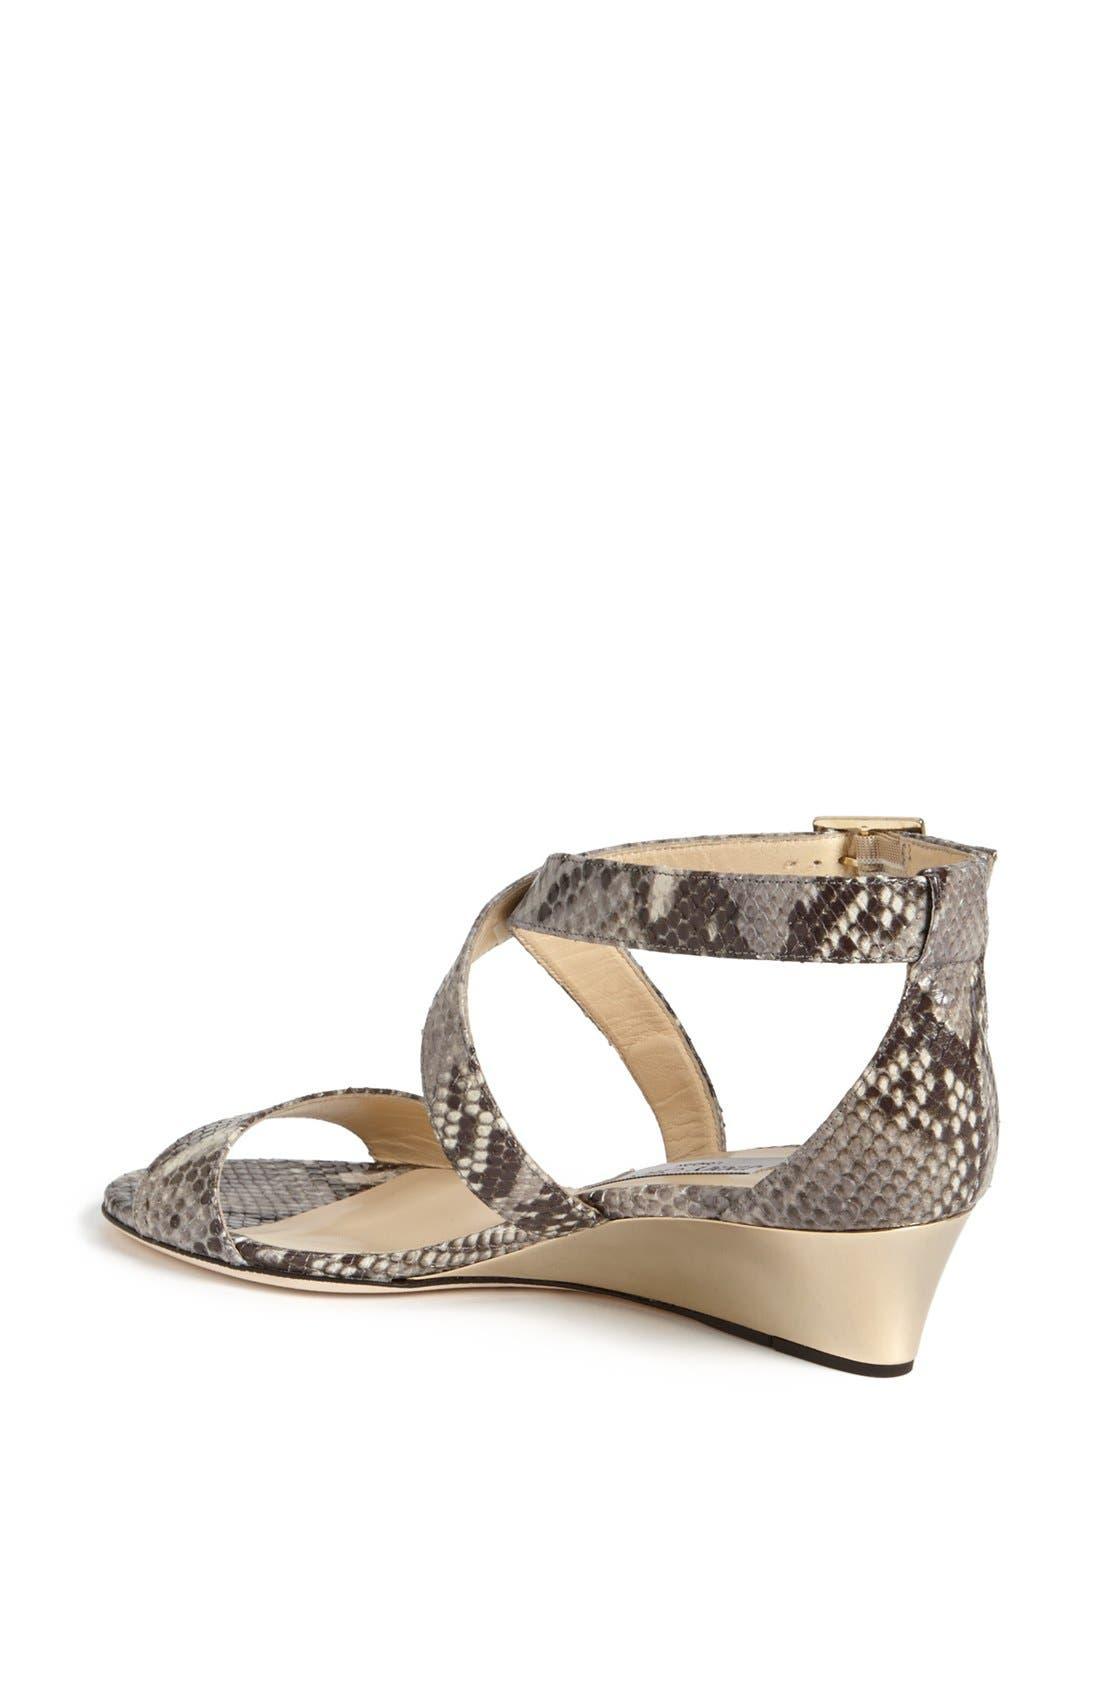 Alternate Image 2  - Jimmy Choo 'Chiara' Wedge Sandal